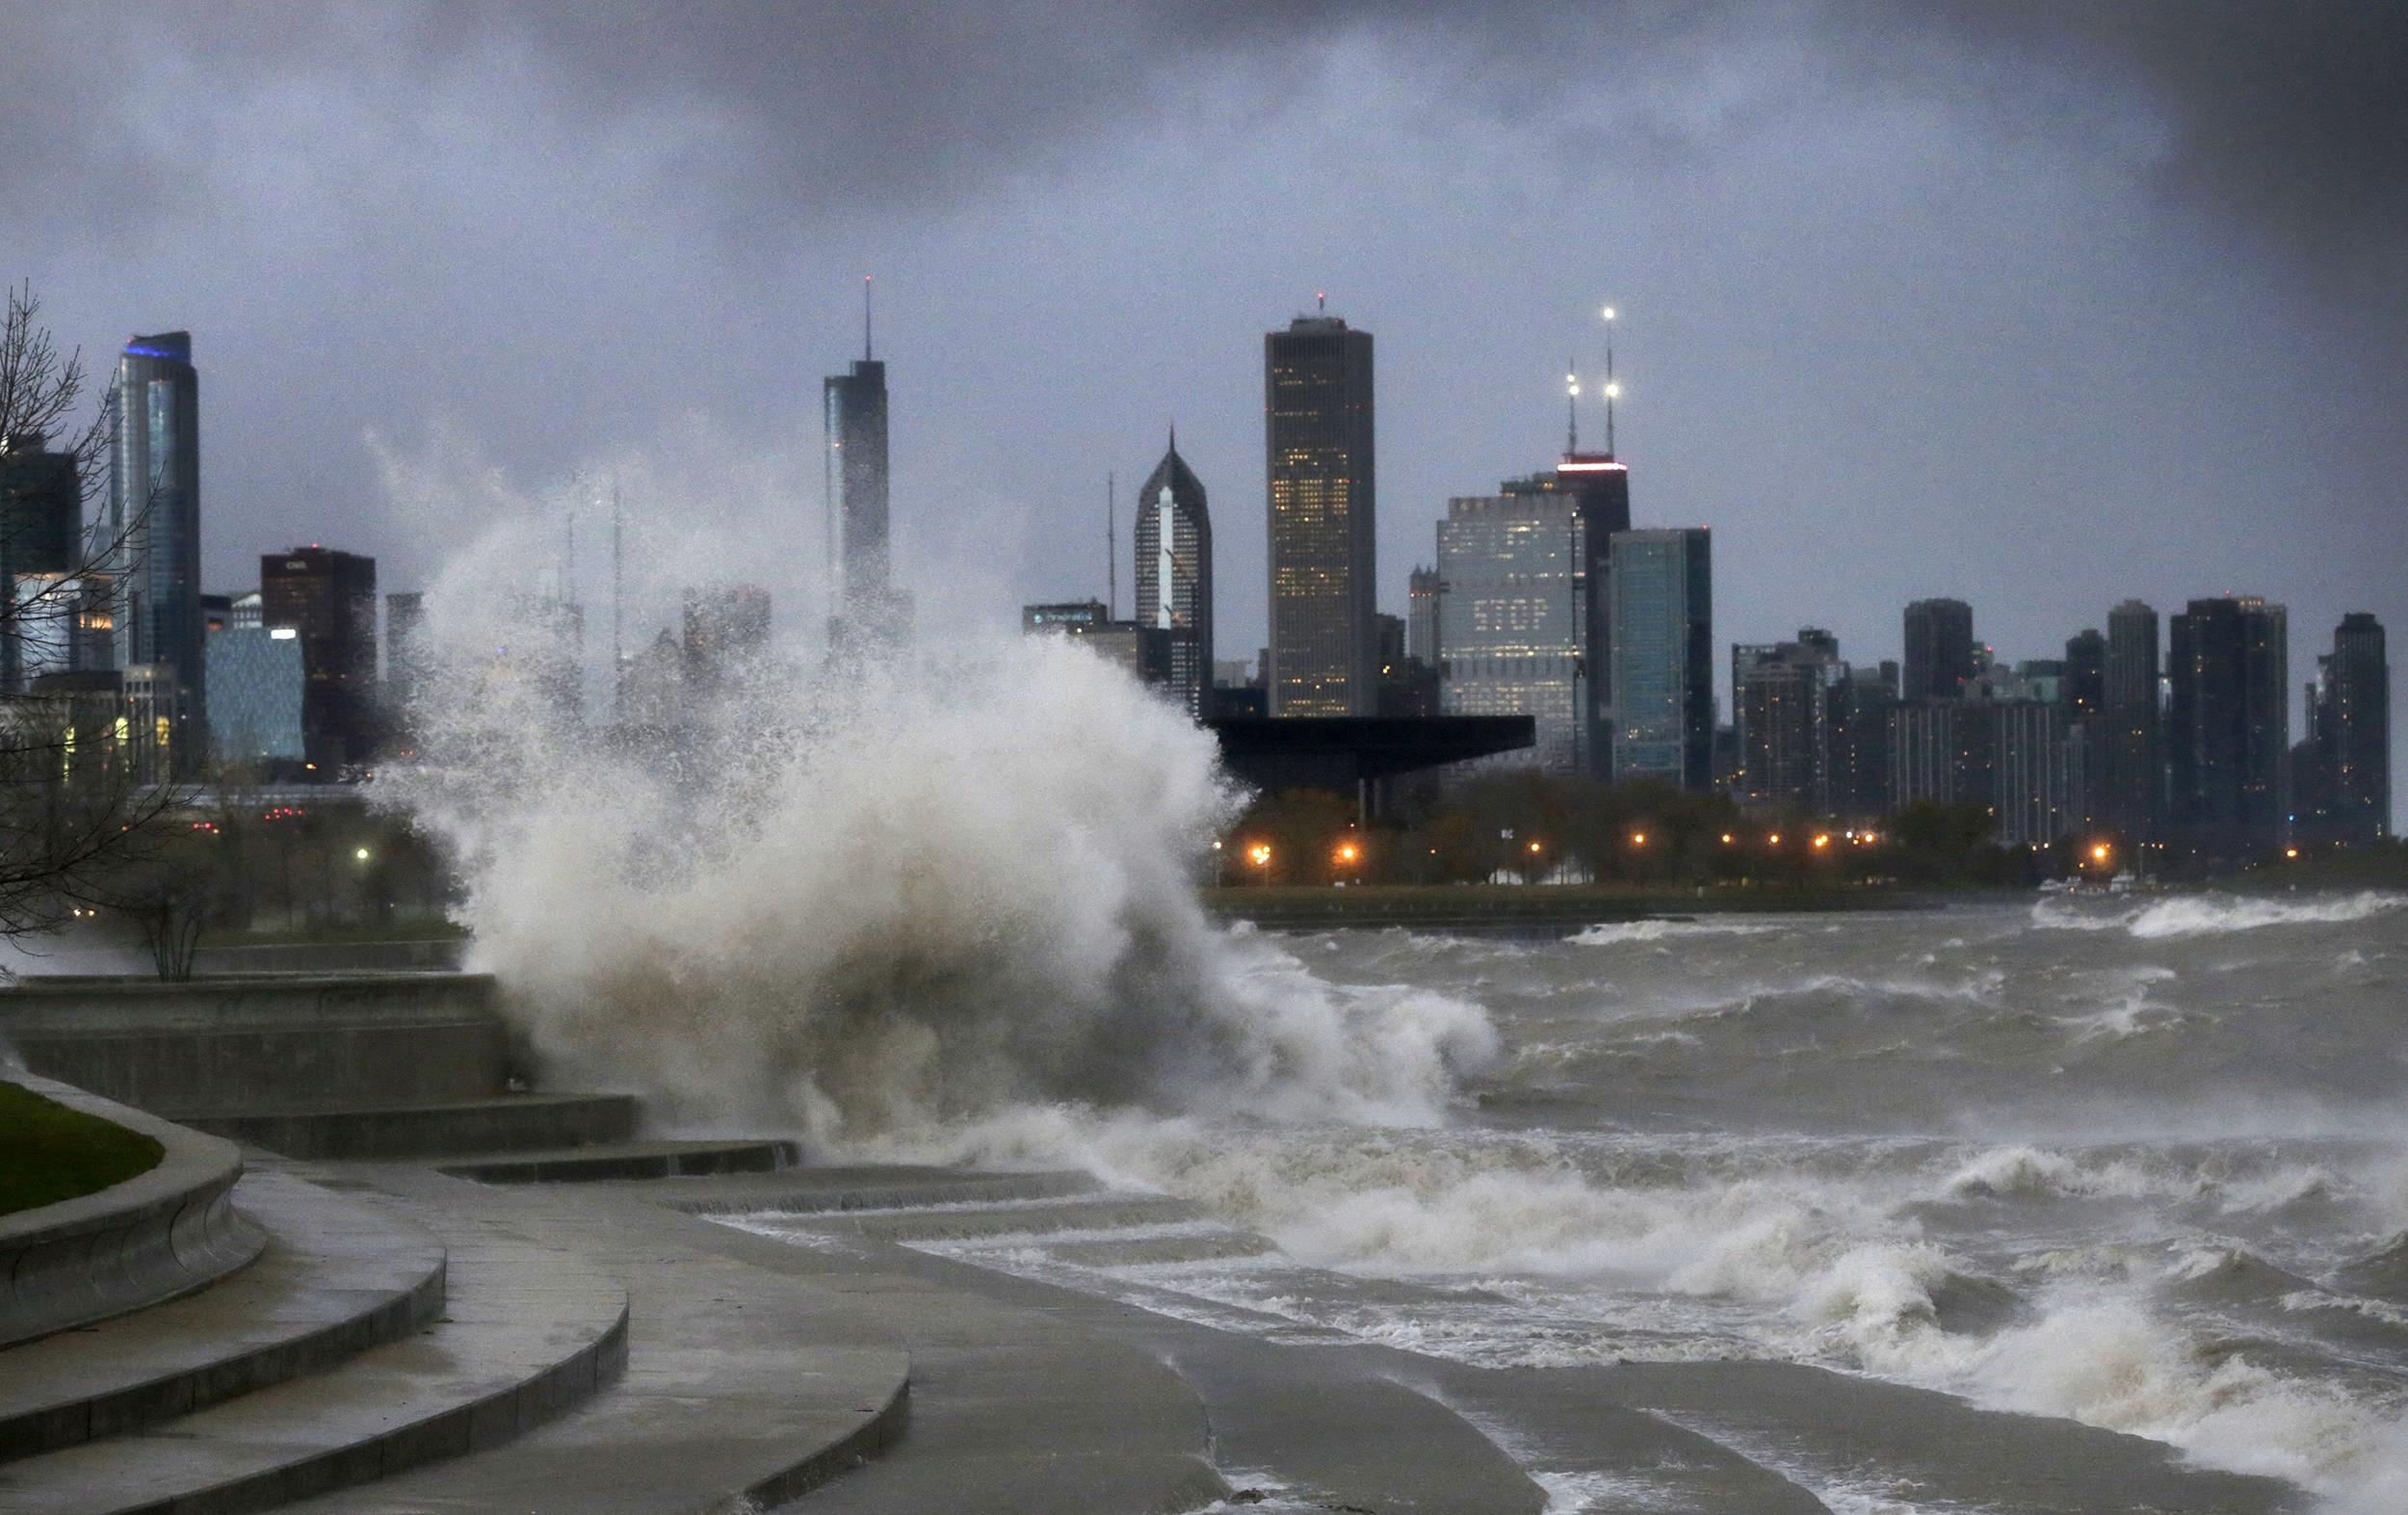 chicago weather - photo #23